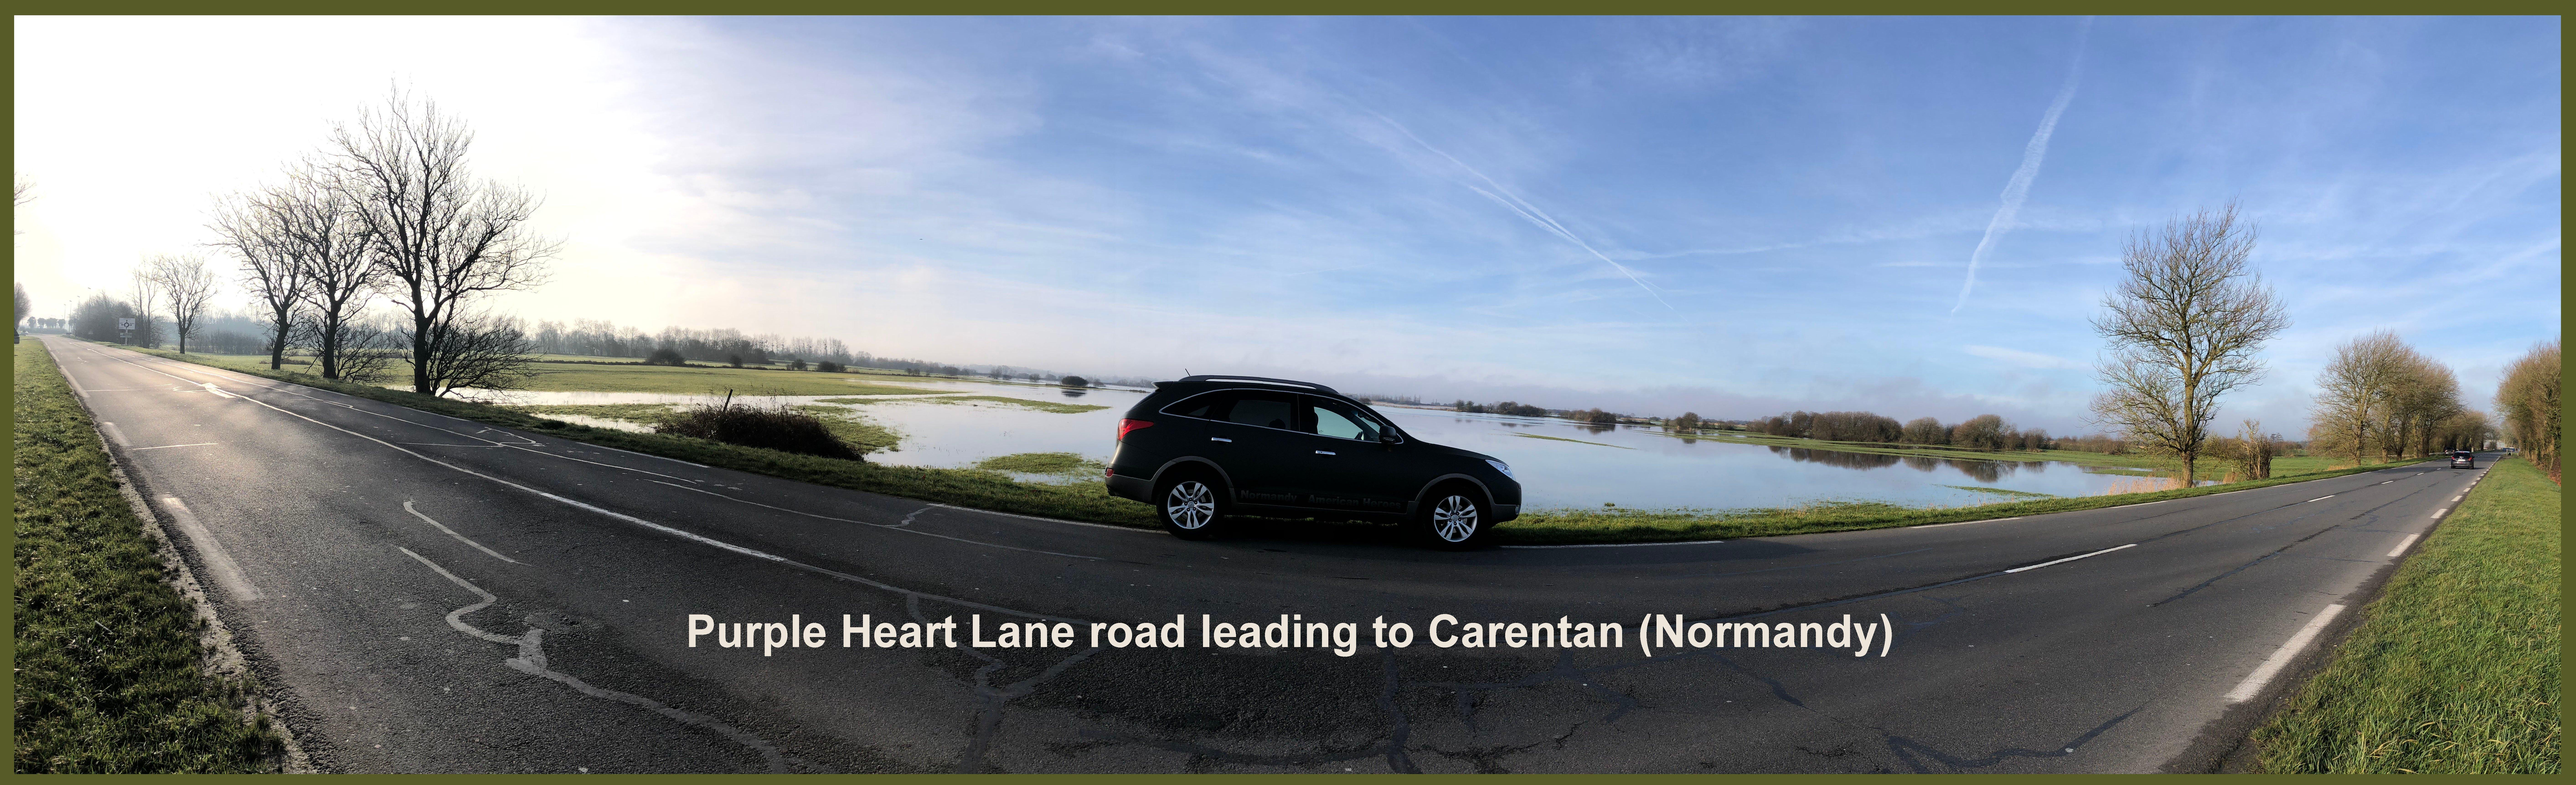 Normandy Carentan swamps with my car